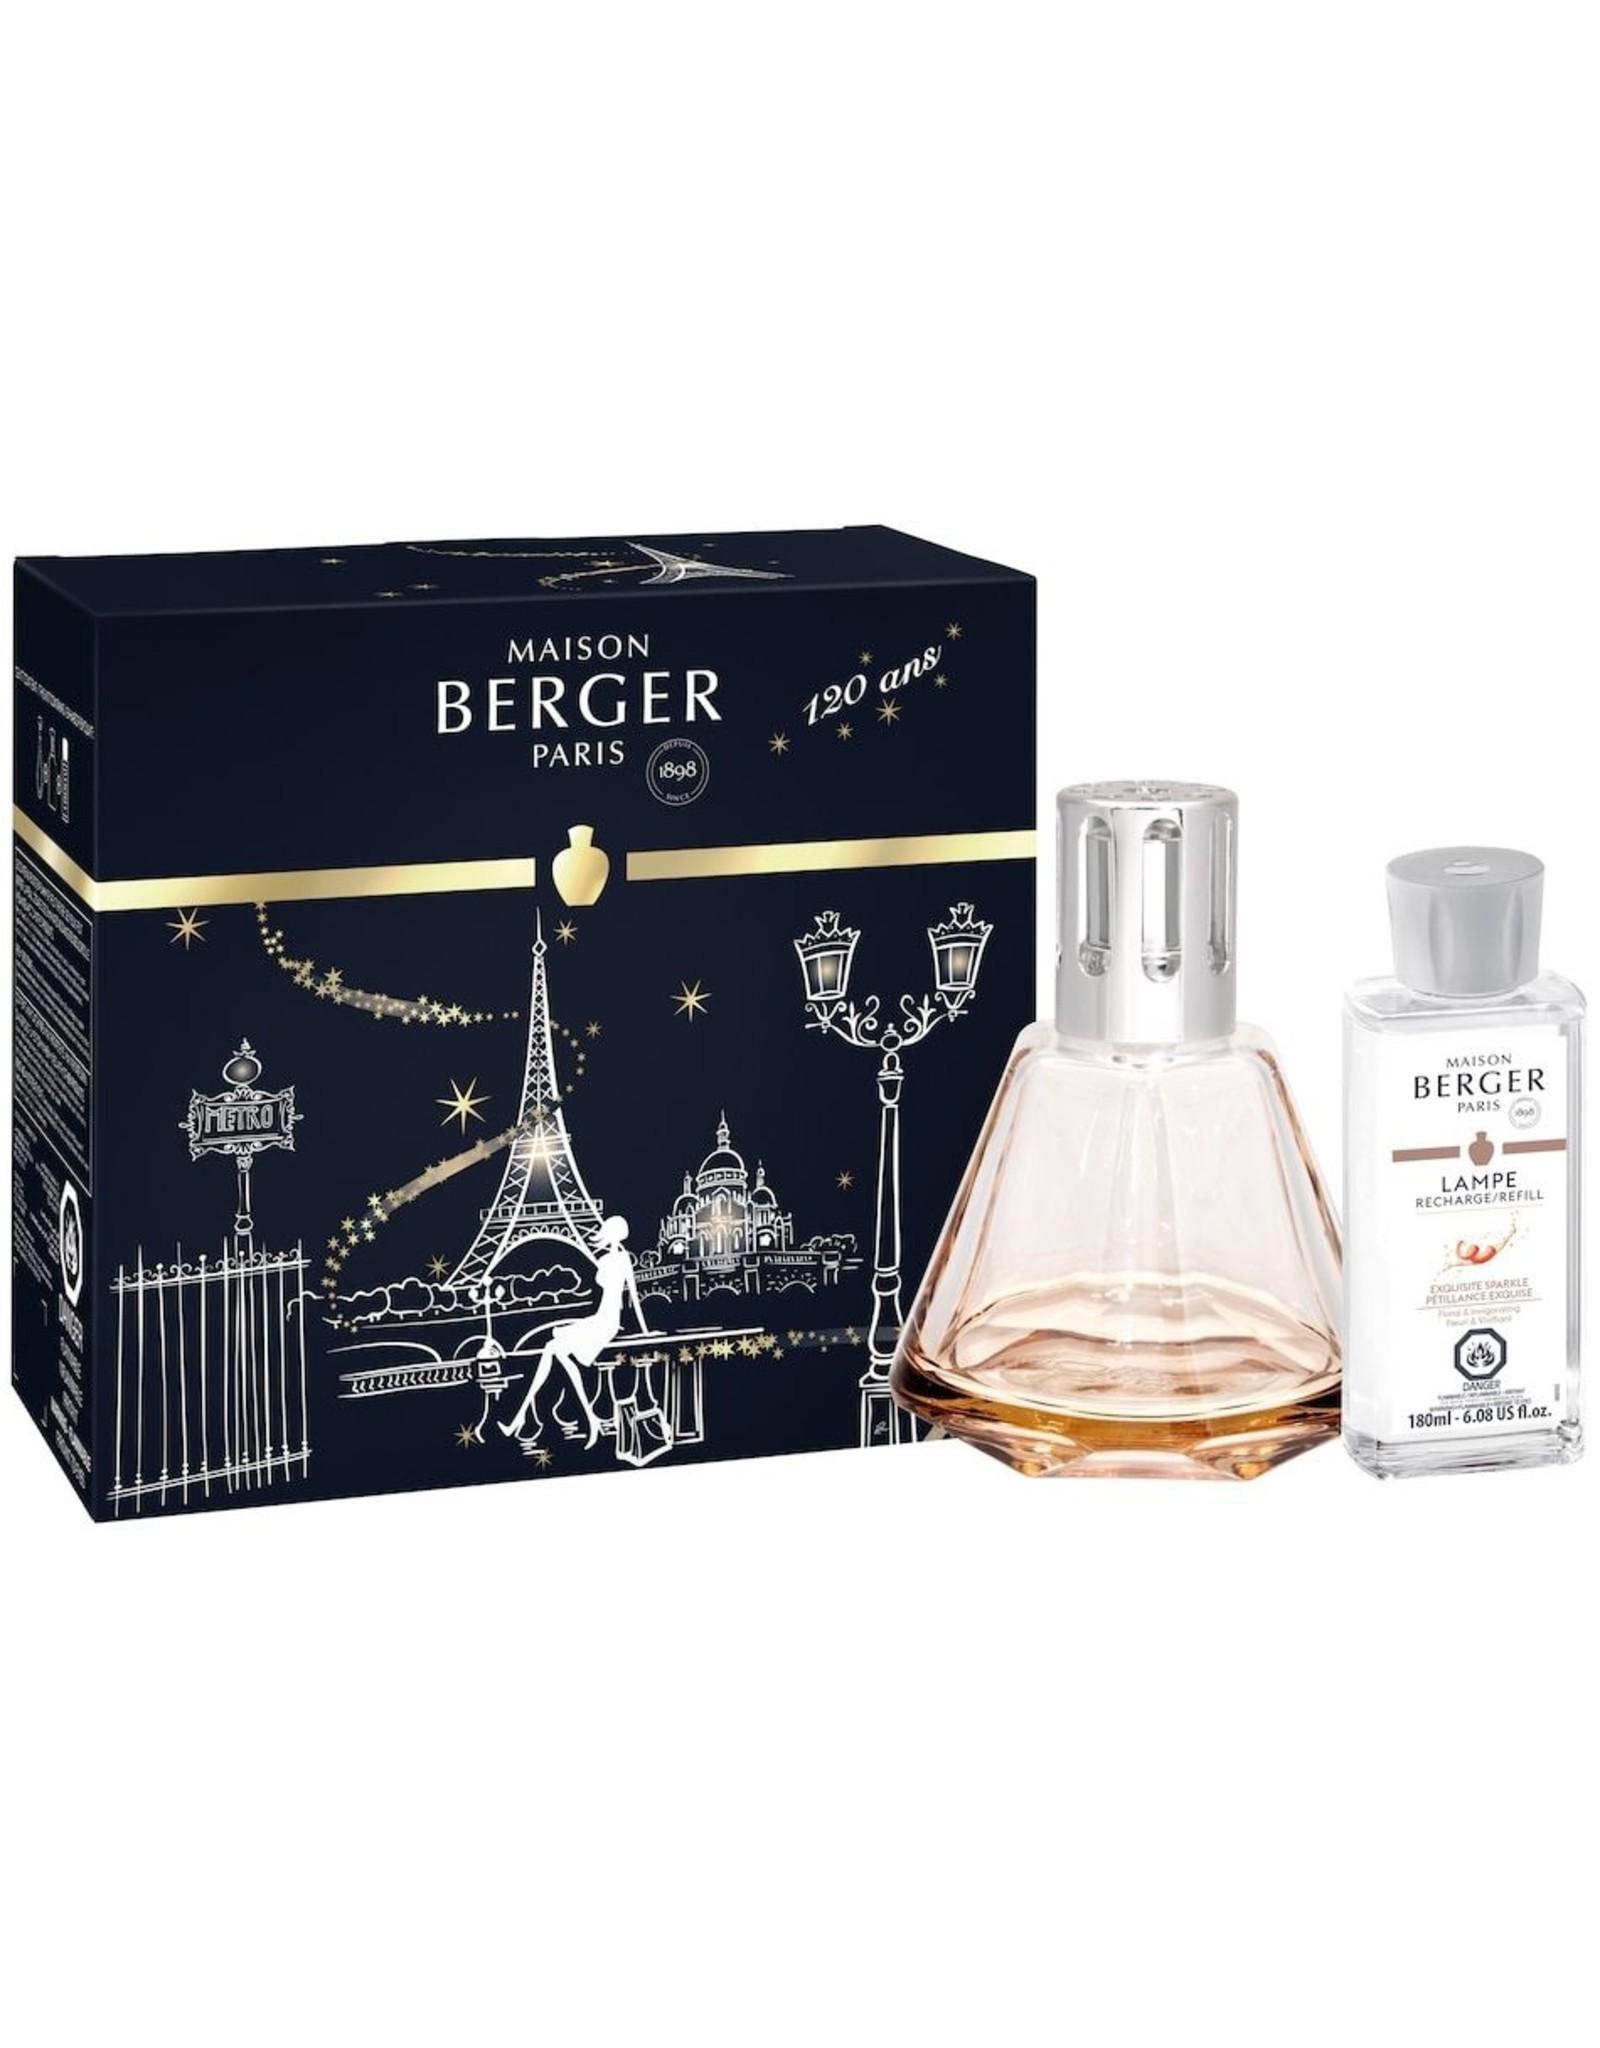 Maison Berger Gem Honey Gift Set Champagne